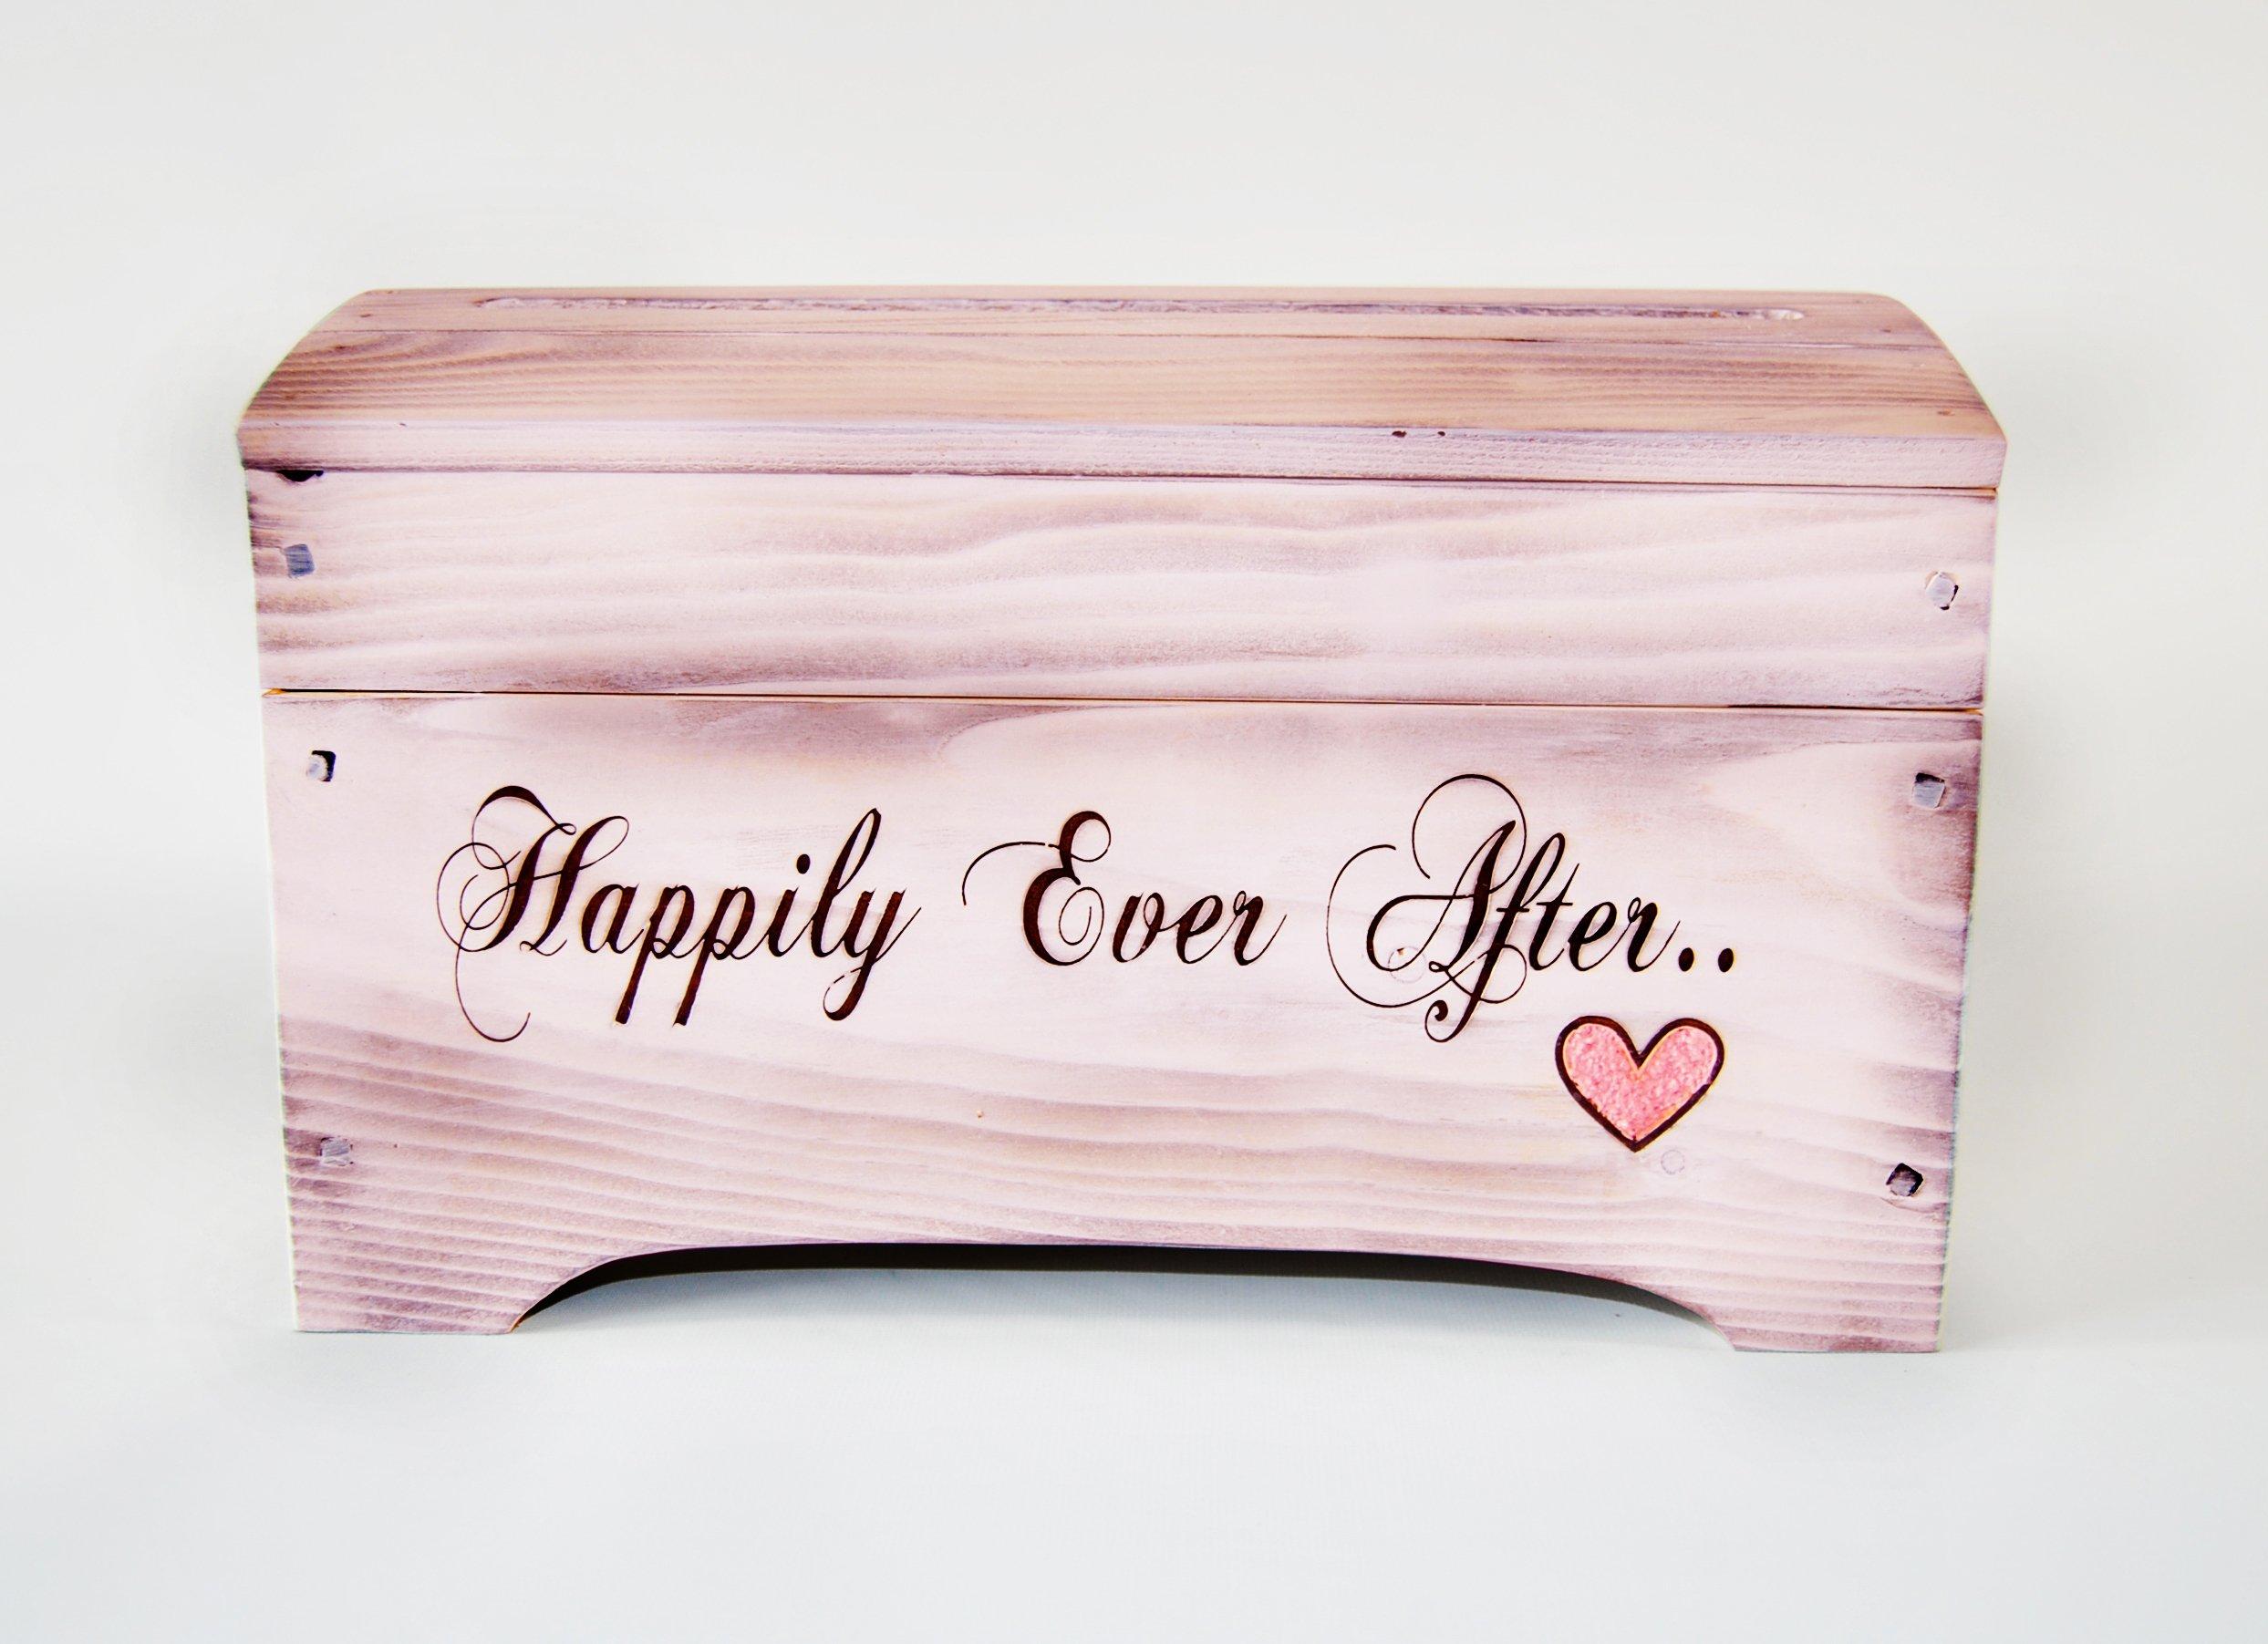 Large Wooden Pink Keepsake Memory Box - Wedding Card Box by Roxy Heart Vintage